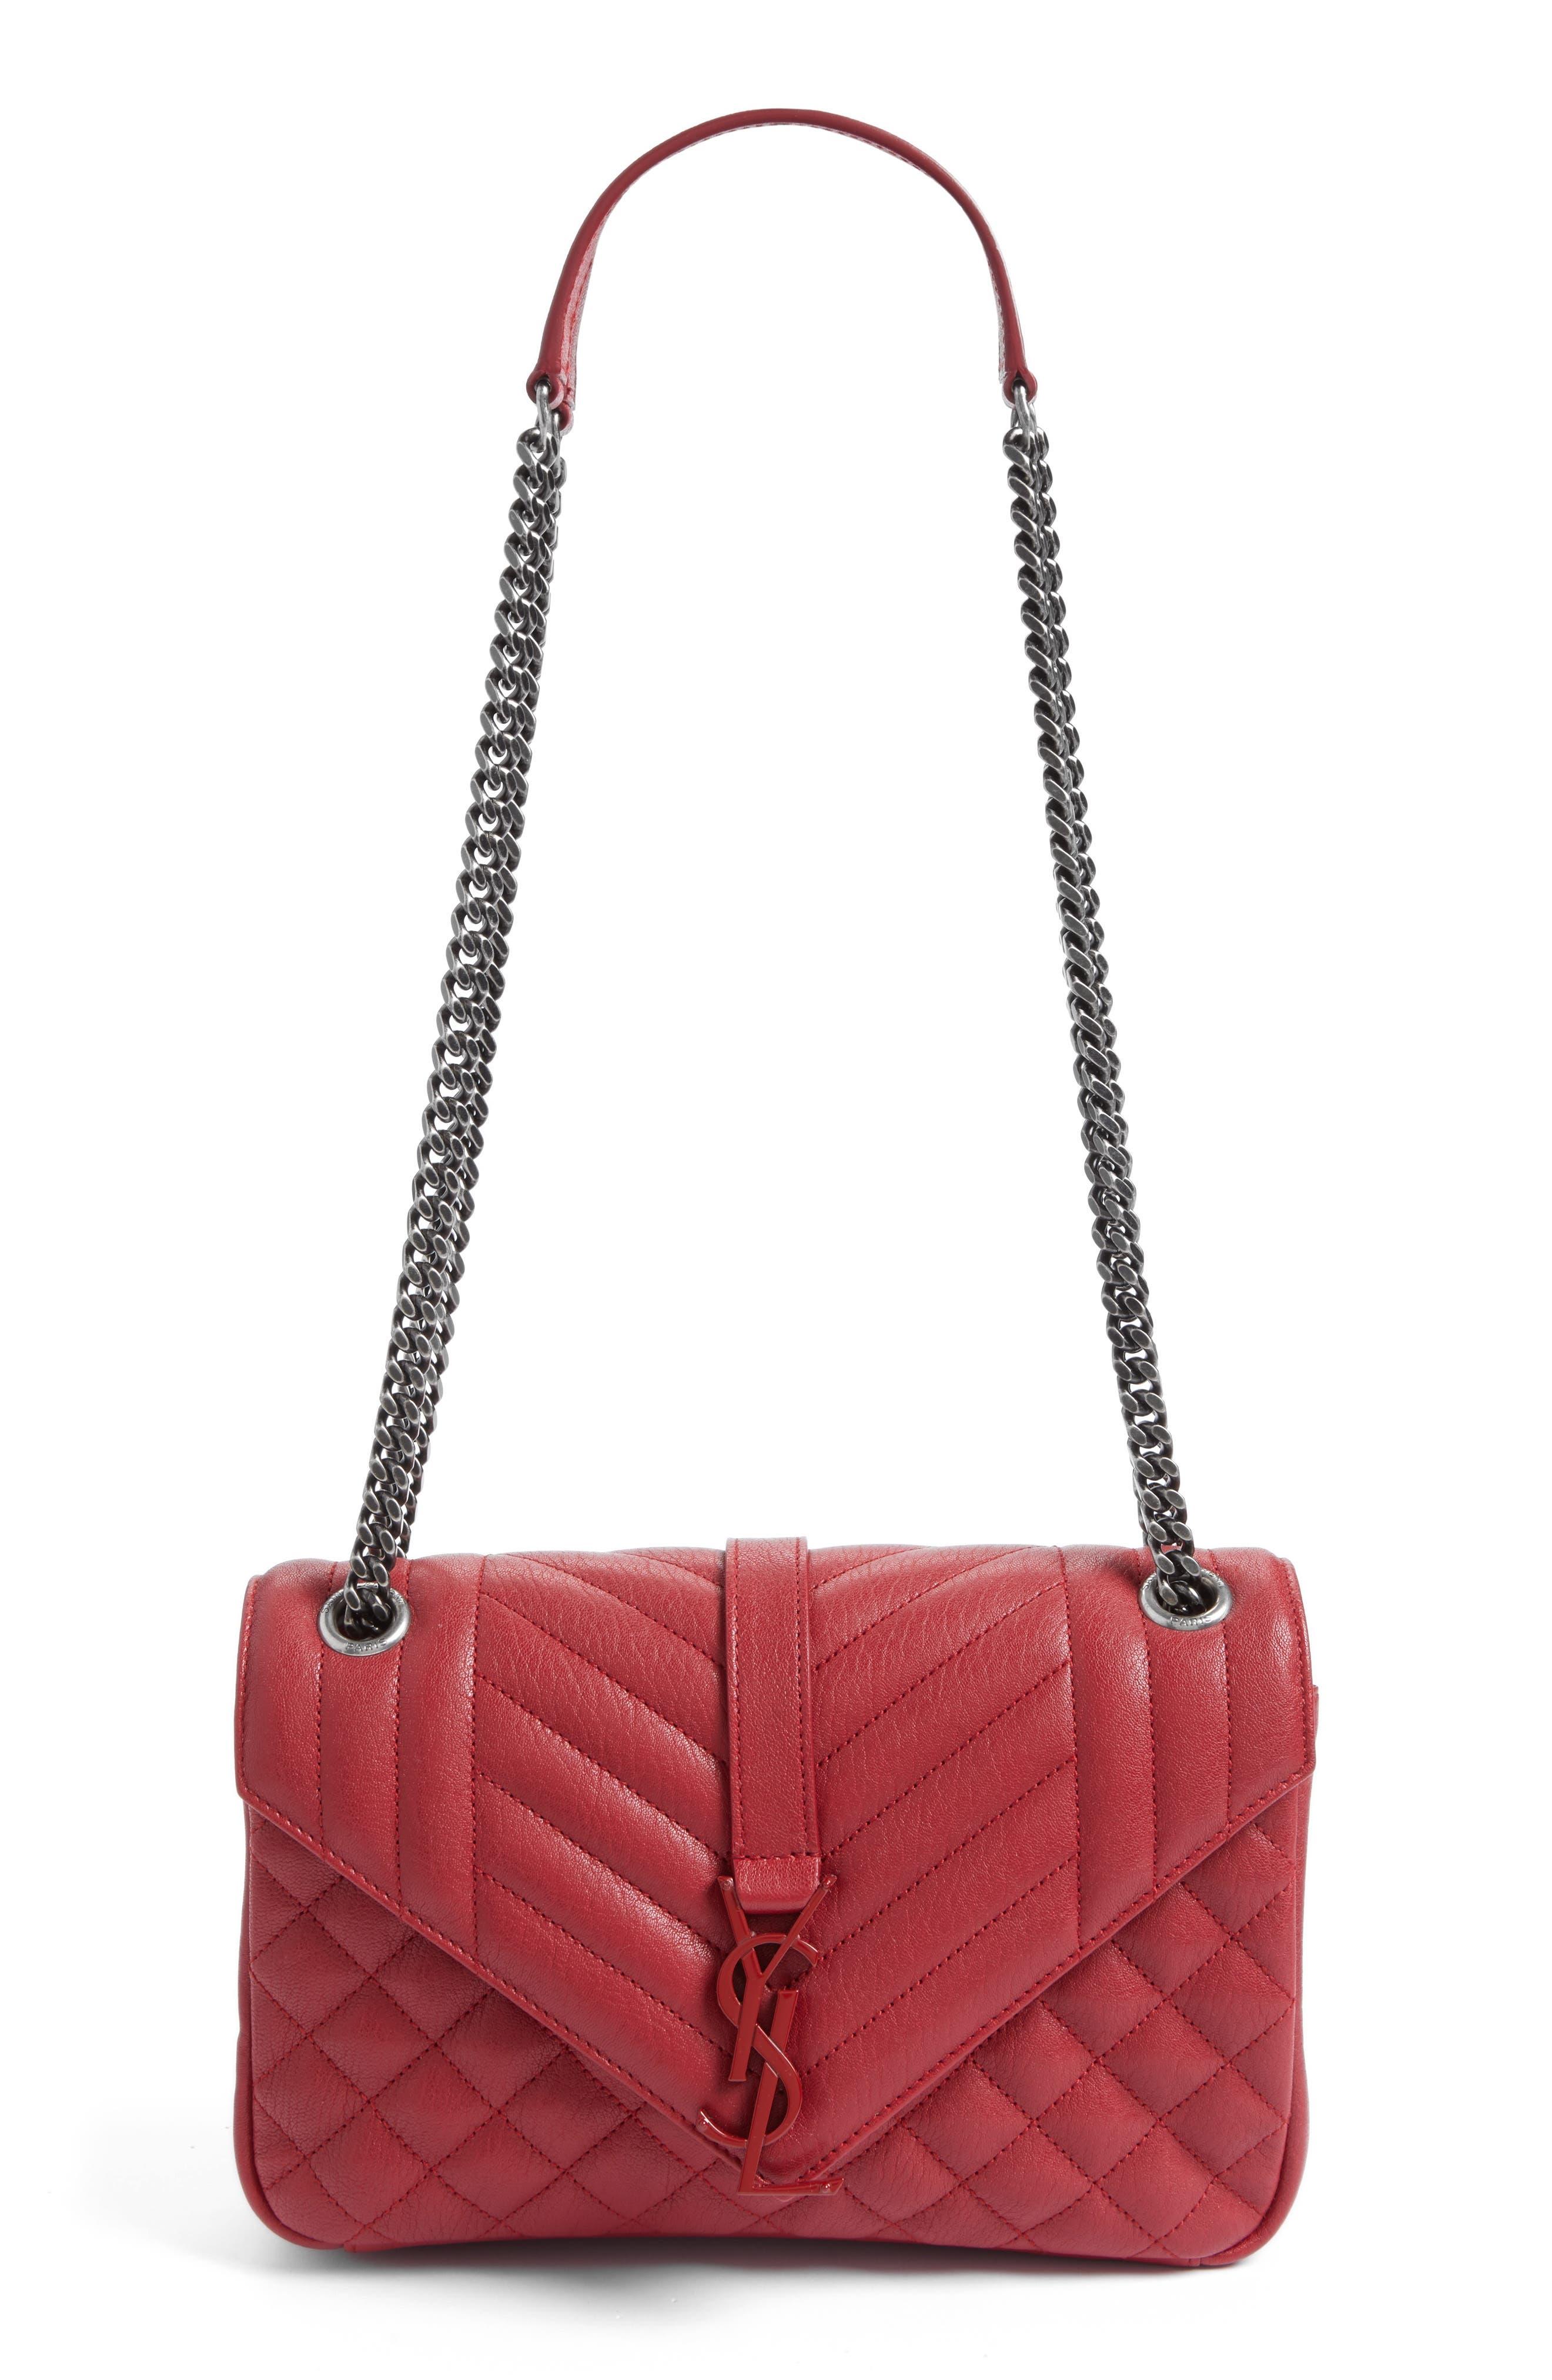 Alternate Image 1 Selected - Saint Laurent Large Monogramme Matelassé Leather Shoulder Bag